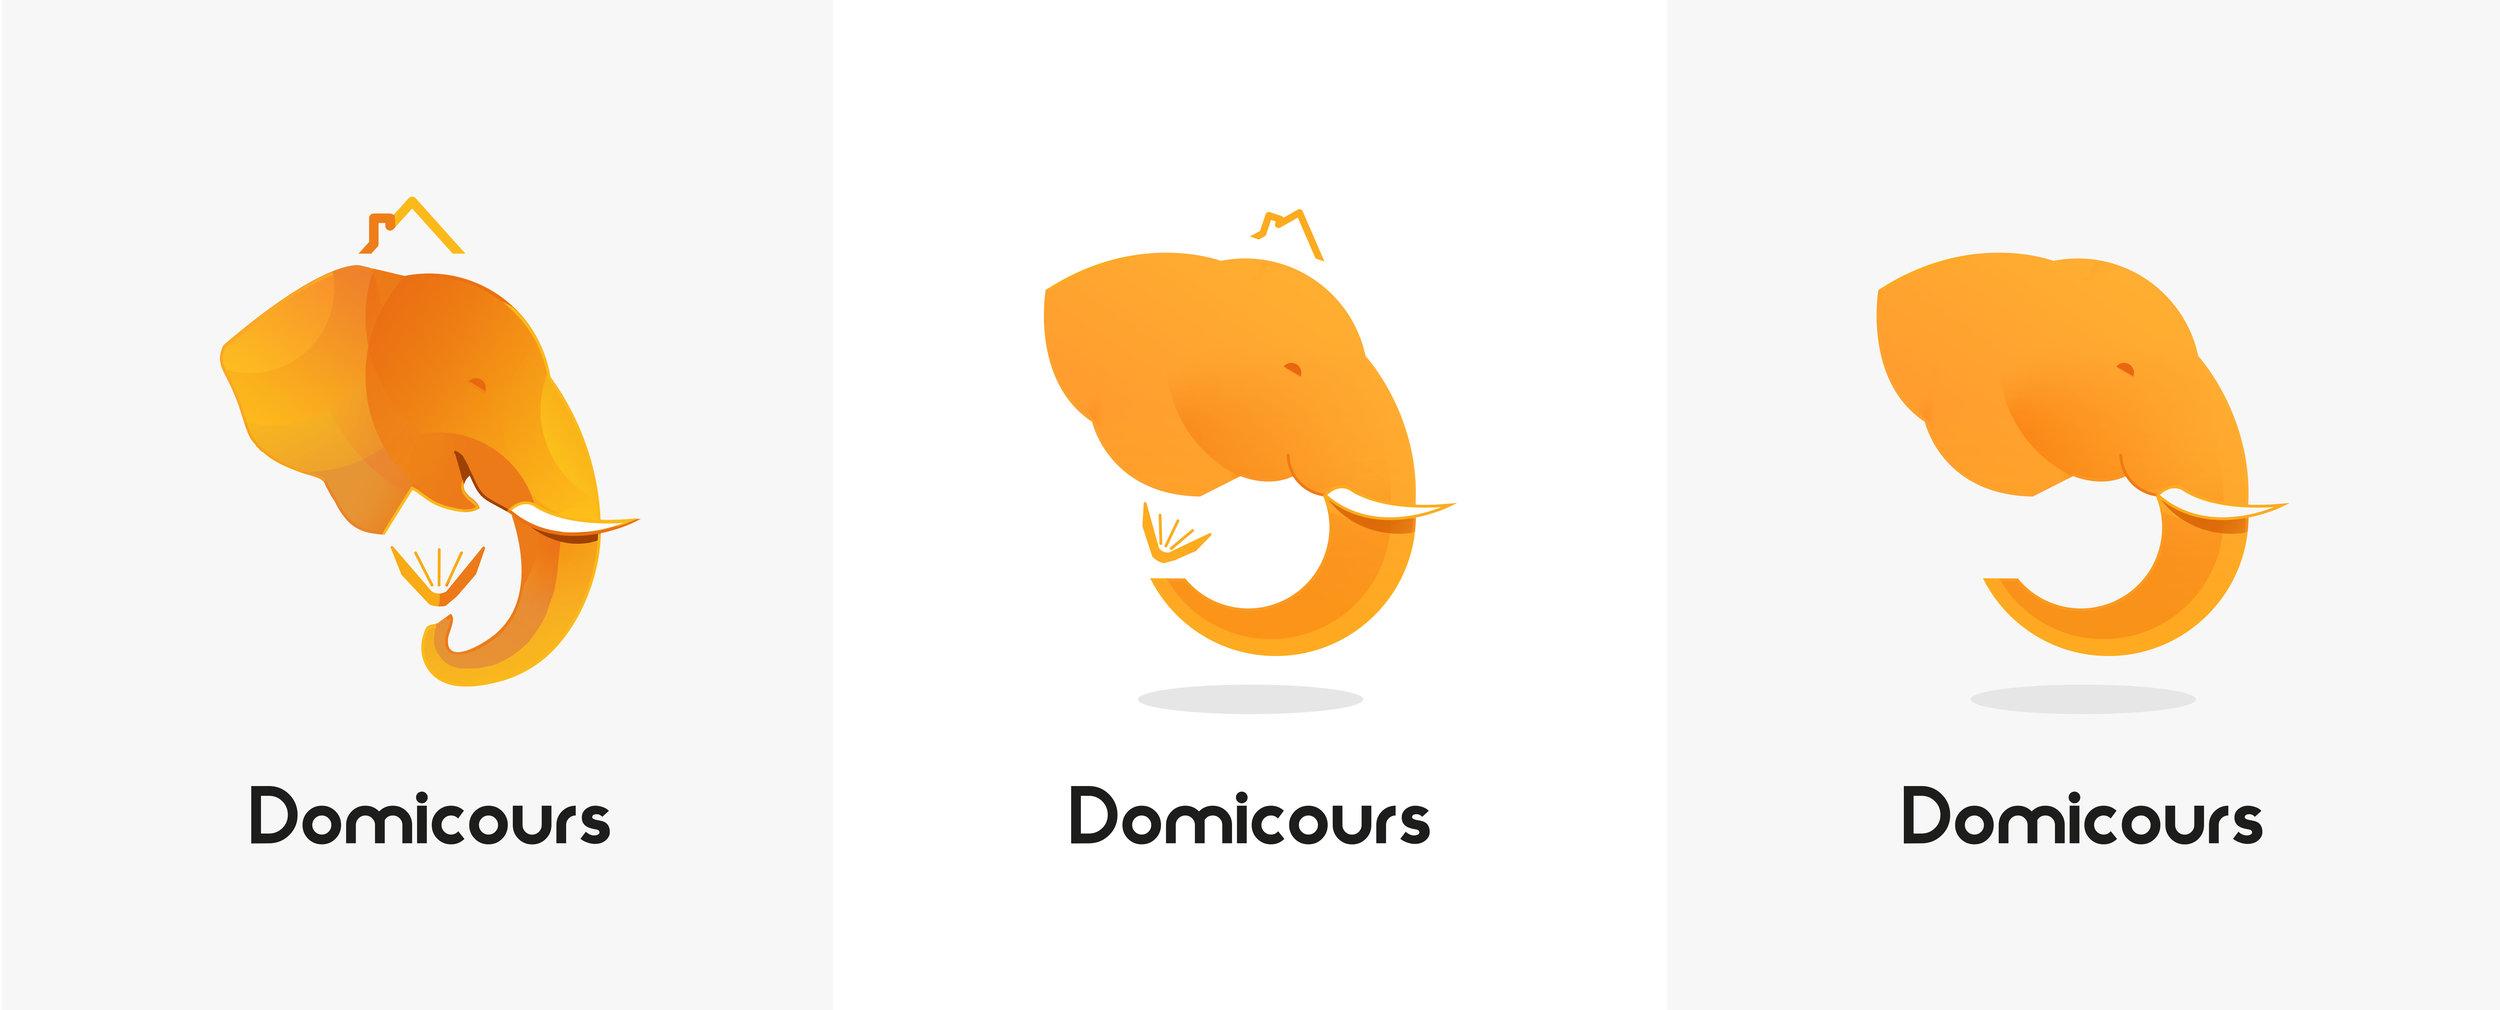 logoDomicoursV2.jpg